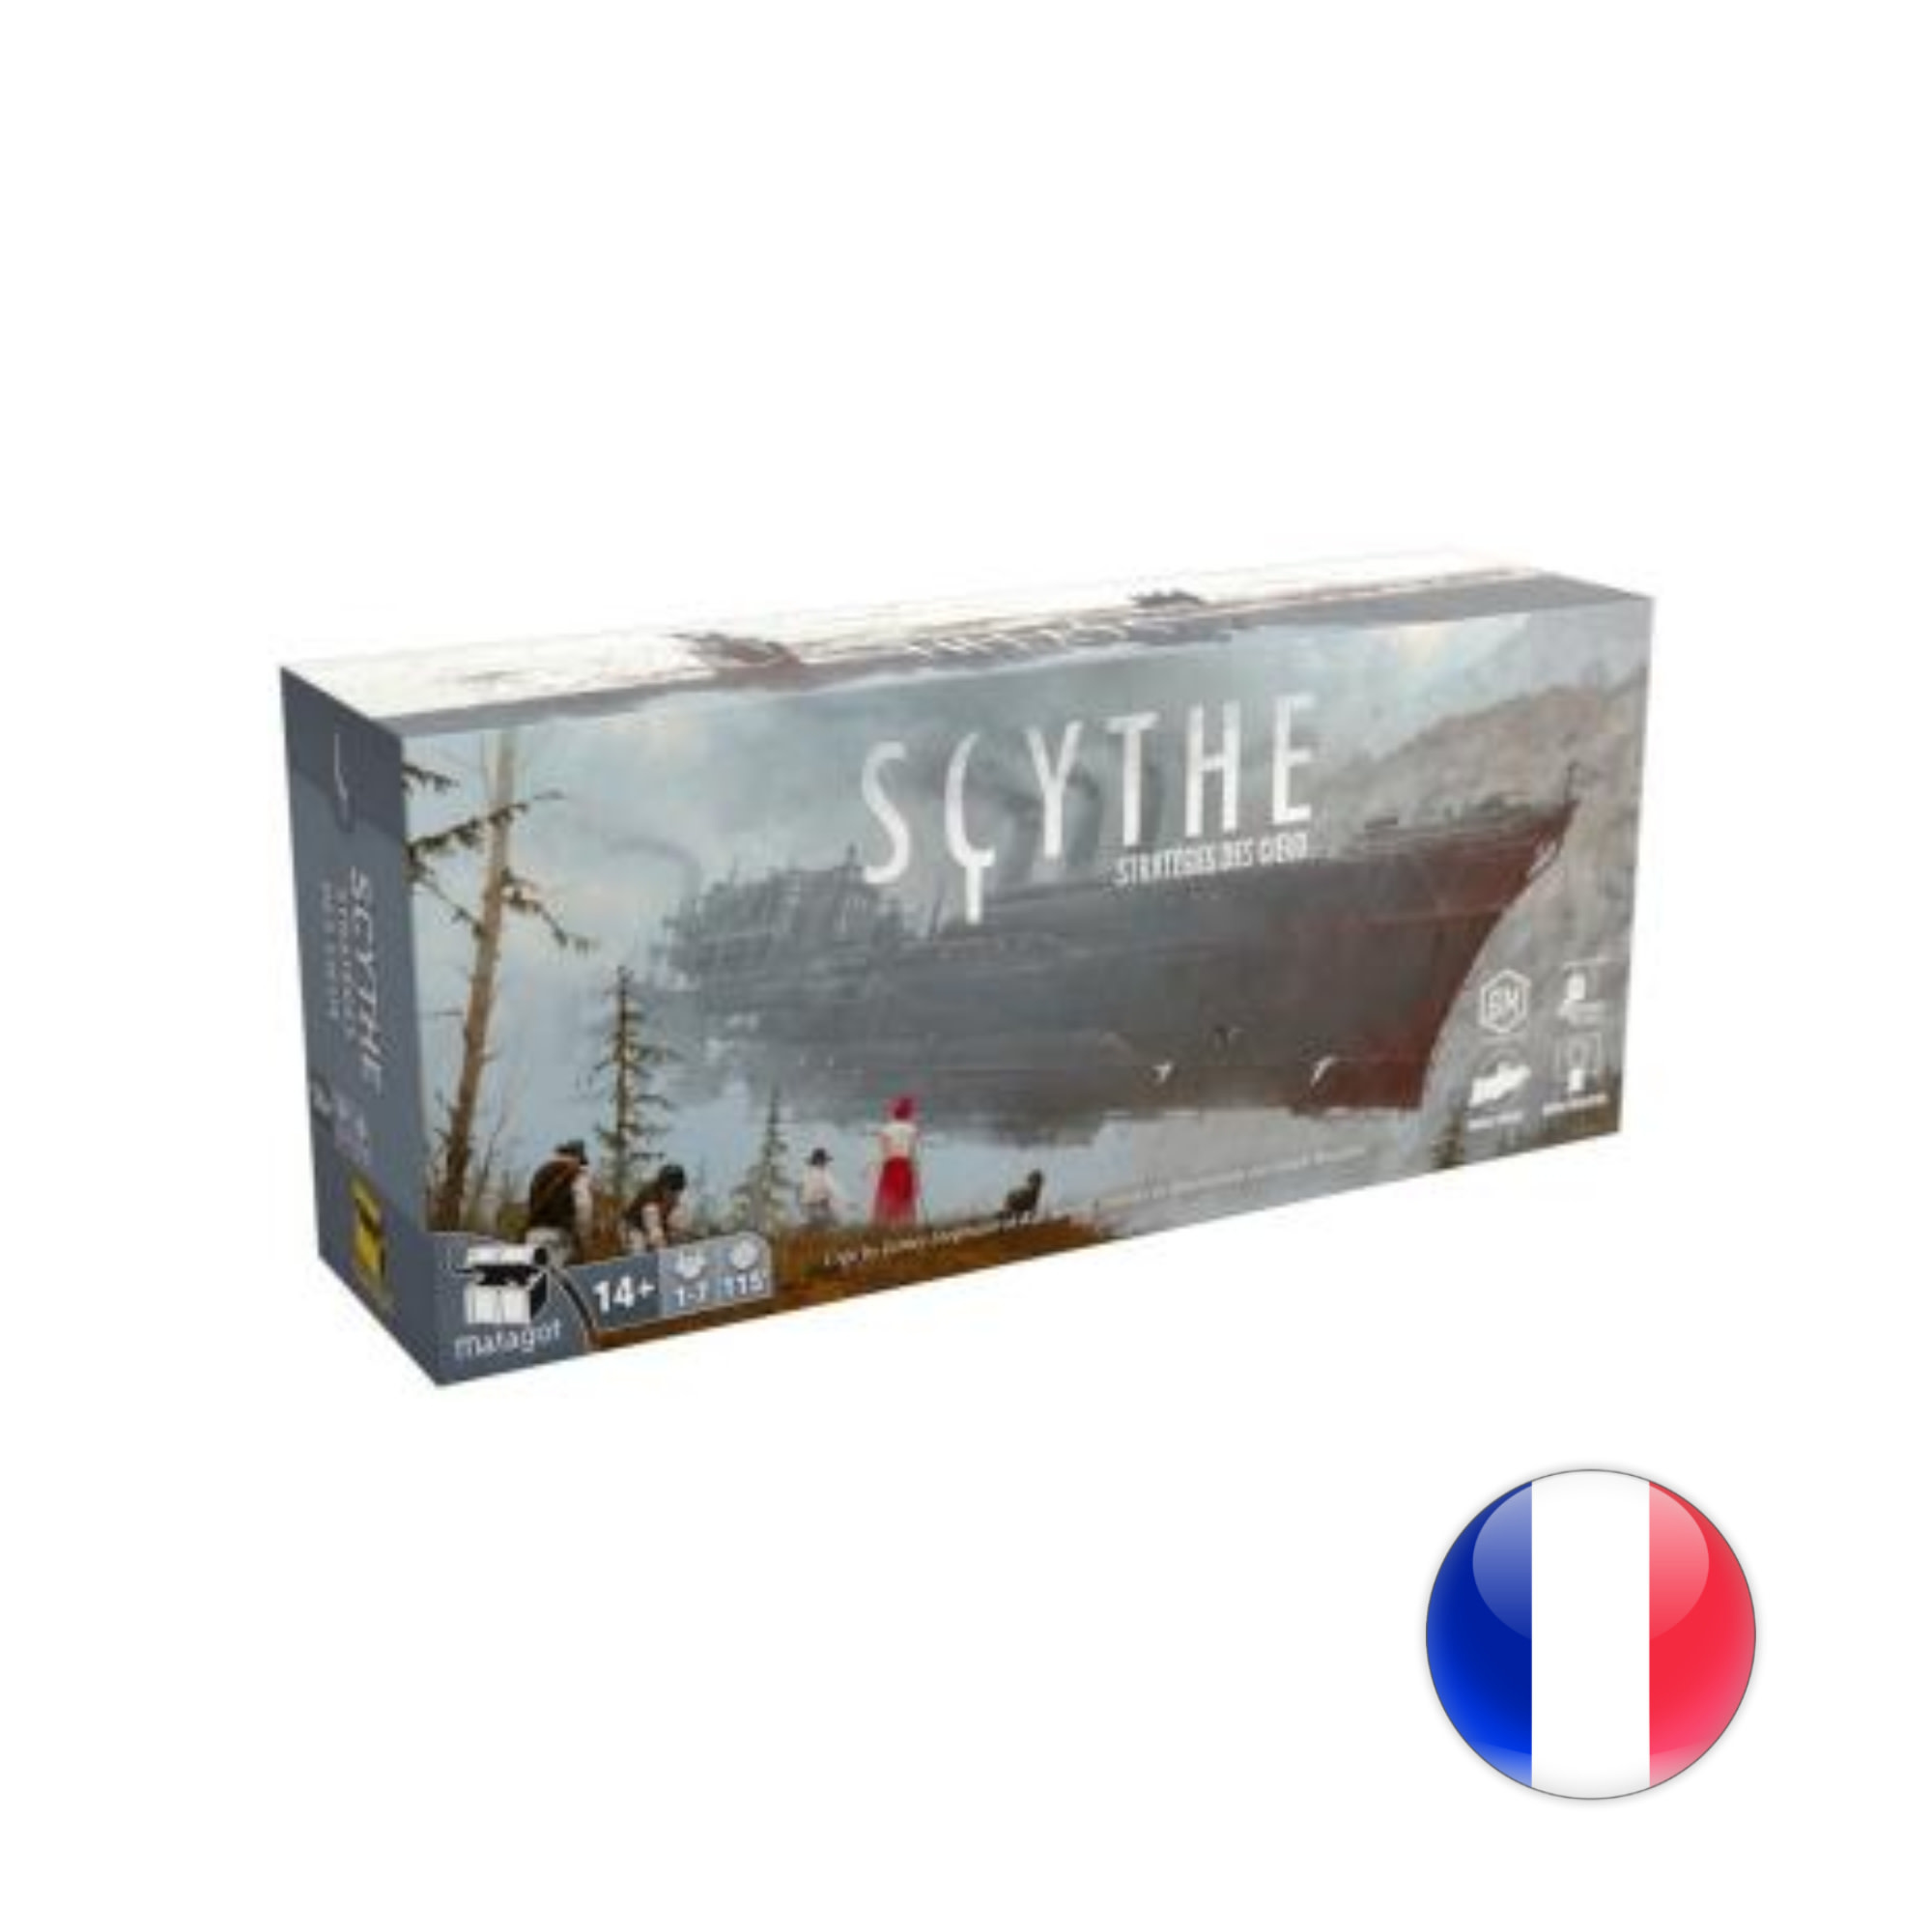 Matagot Scythe / Stratèges des cieux